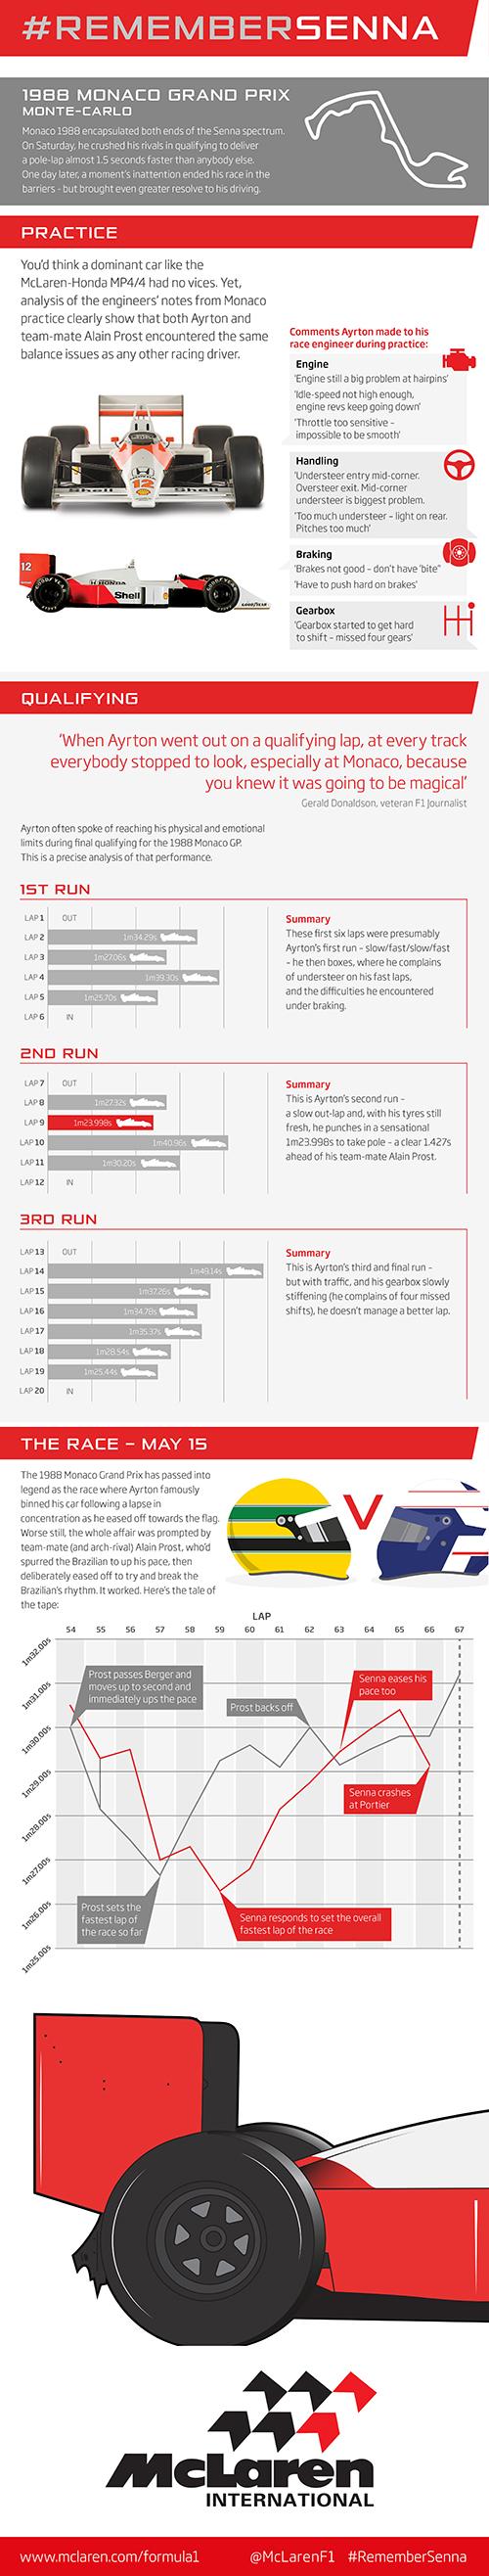 1993 Monaco Grand Prix [infographic] #RememberSenna